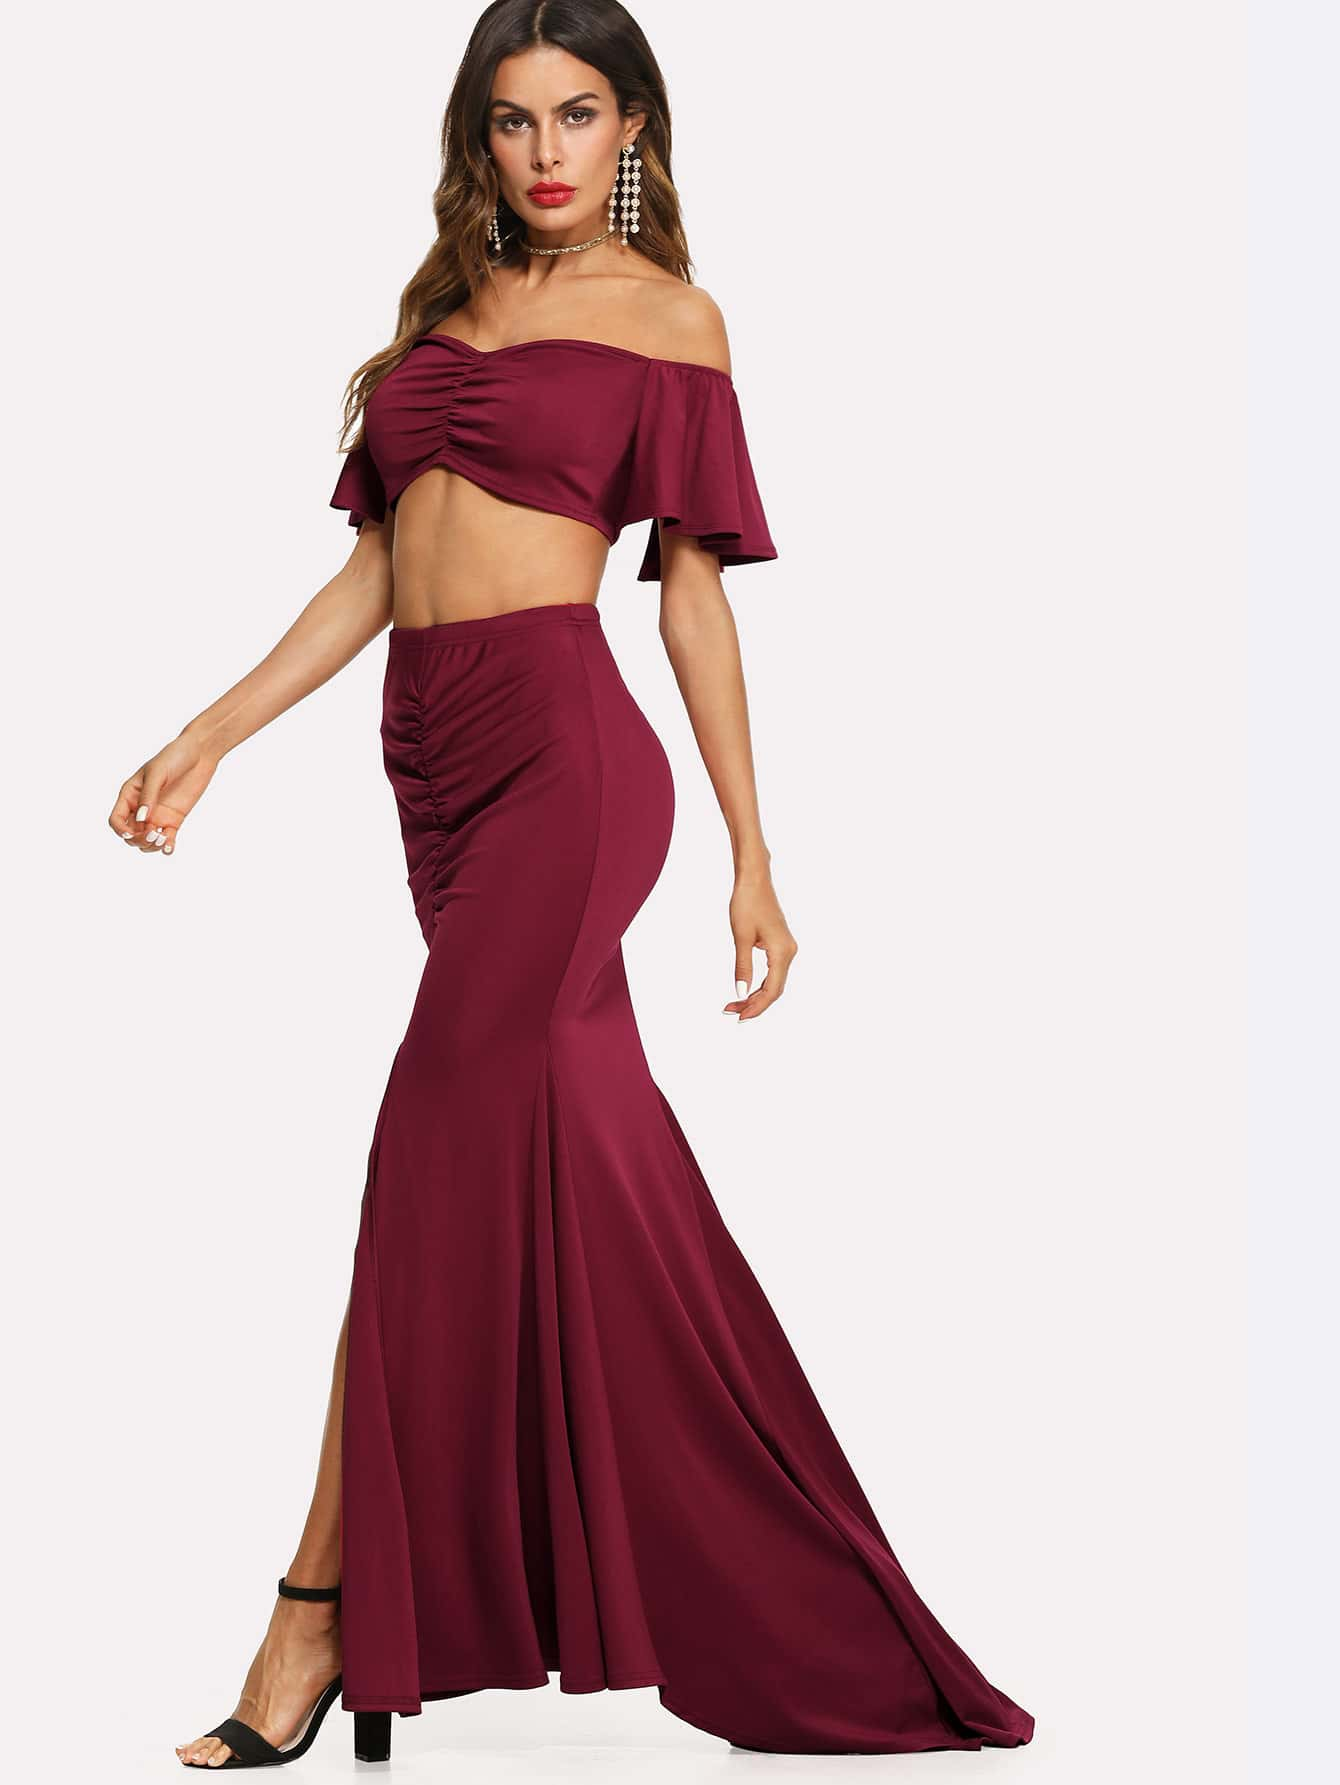 Drawstring Front Crop Top & Ruched Slit Skirt Set solid ruched knit skirt